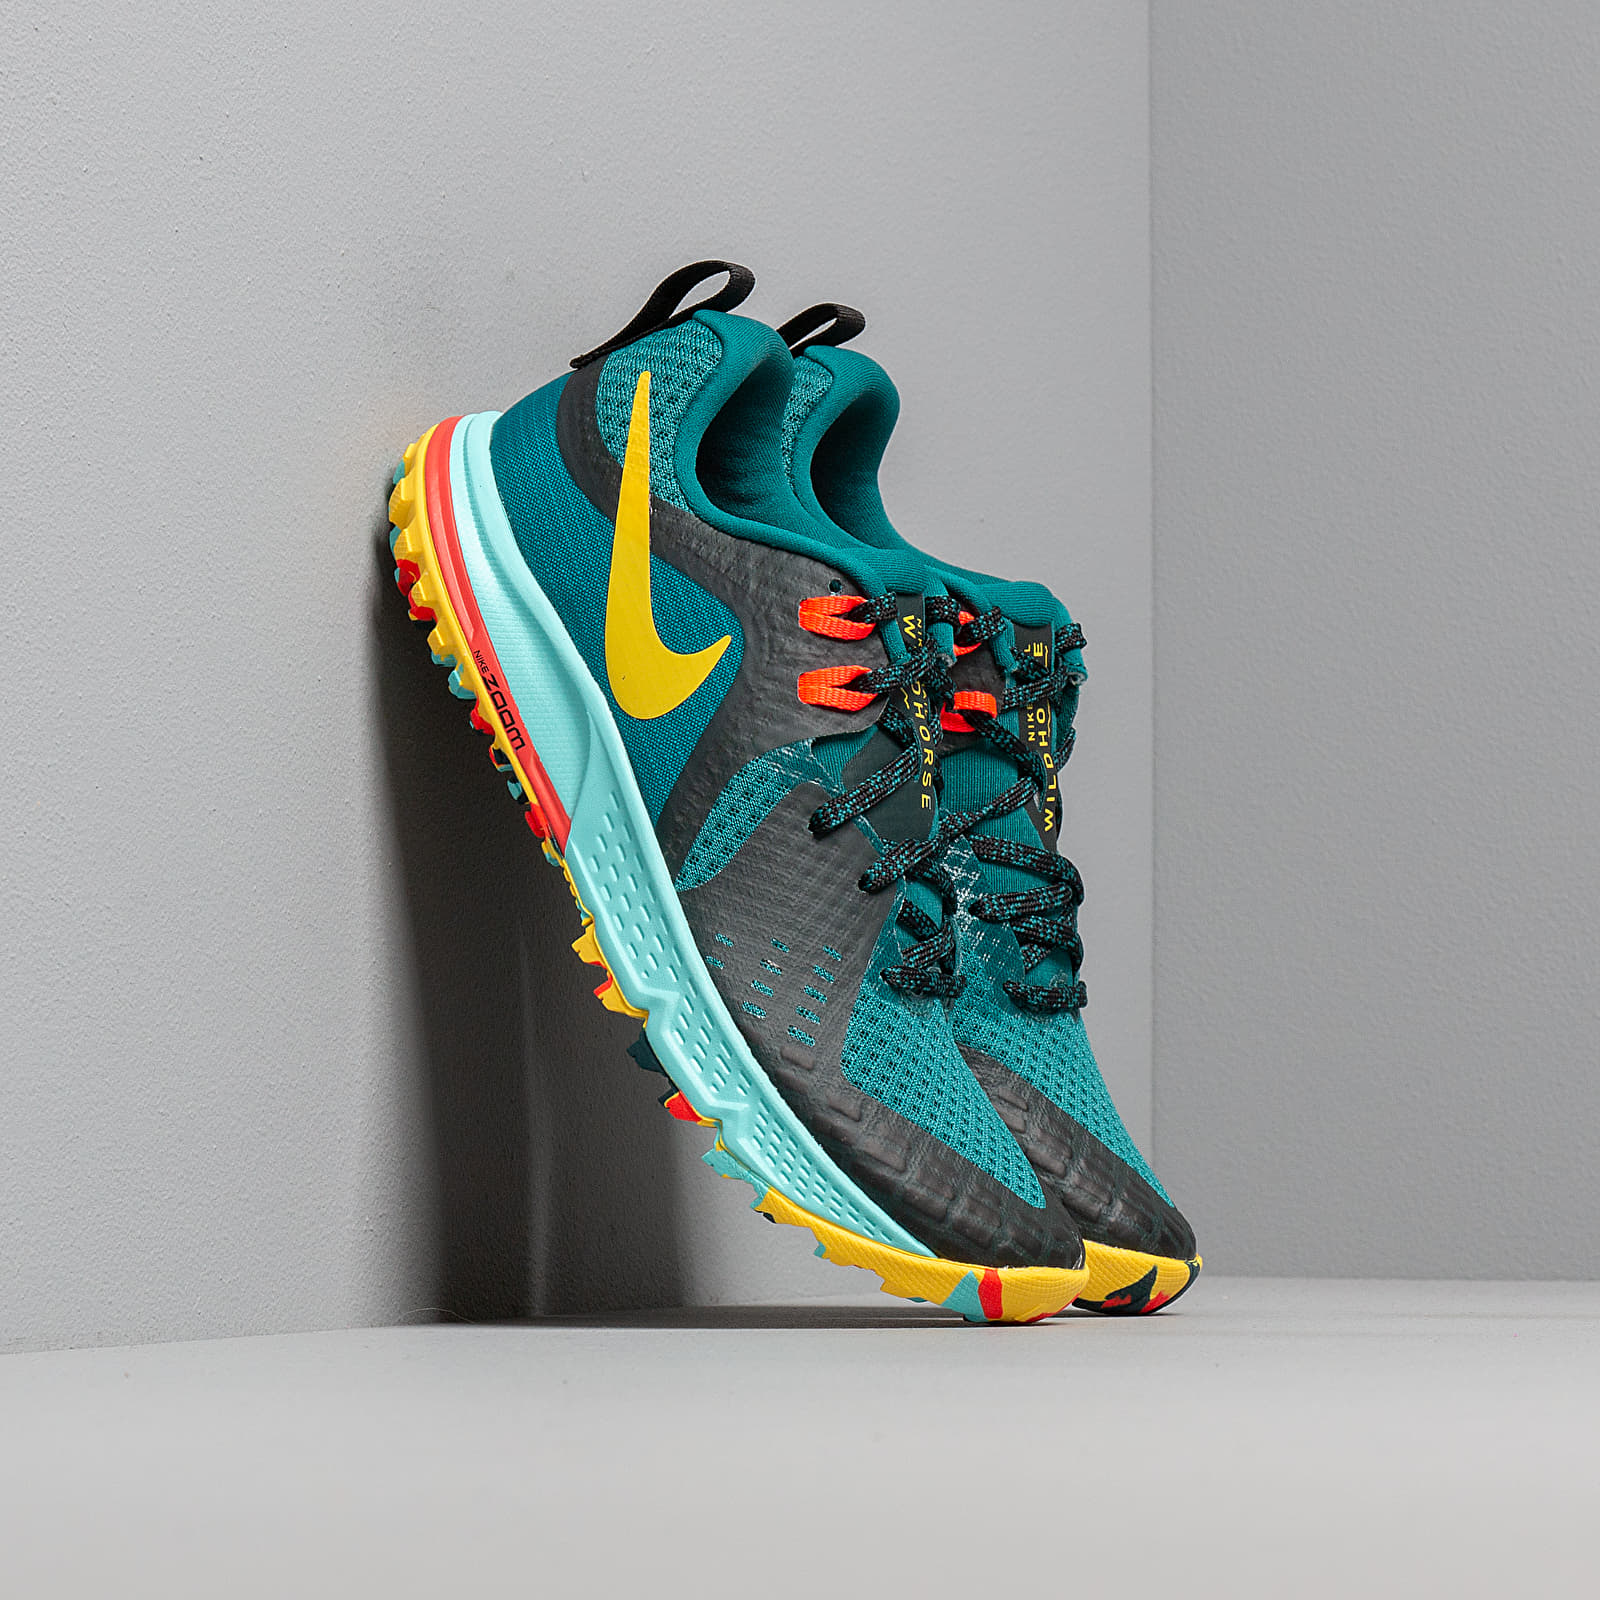 Nike Wmns Air Zoom Wildhorse 5 Geode Teal Chrome Yellow Black   Footshop